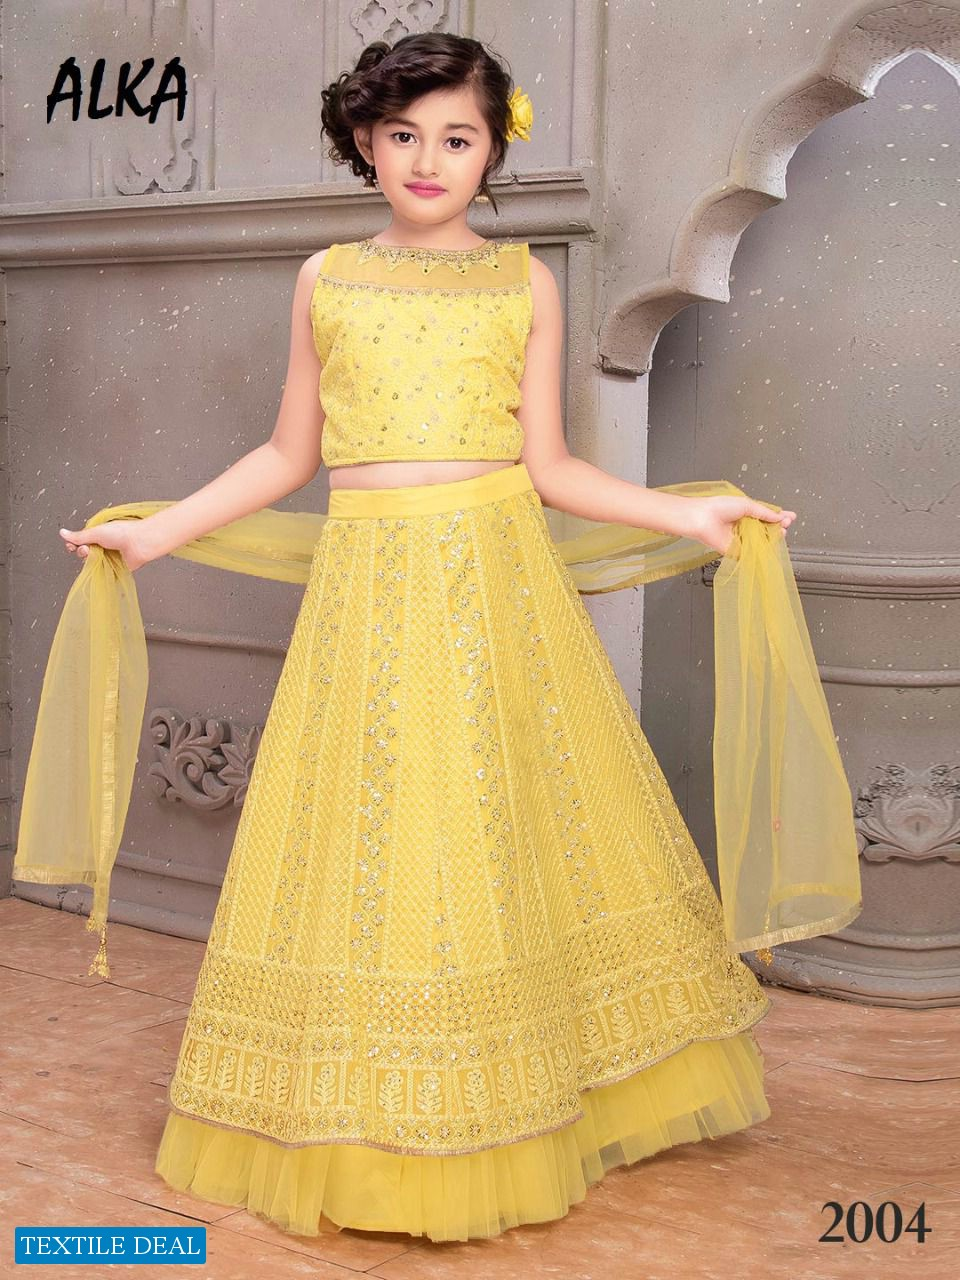 Alka Nandita Wholesale Kidswear Lehengas